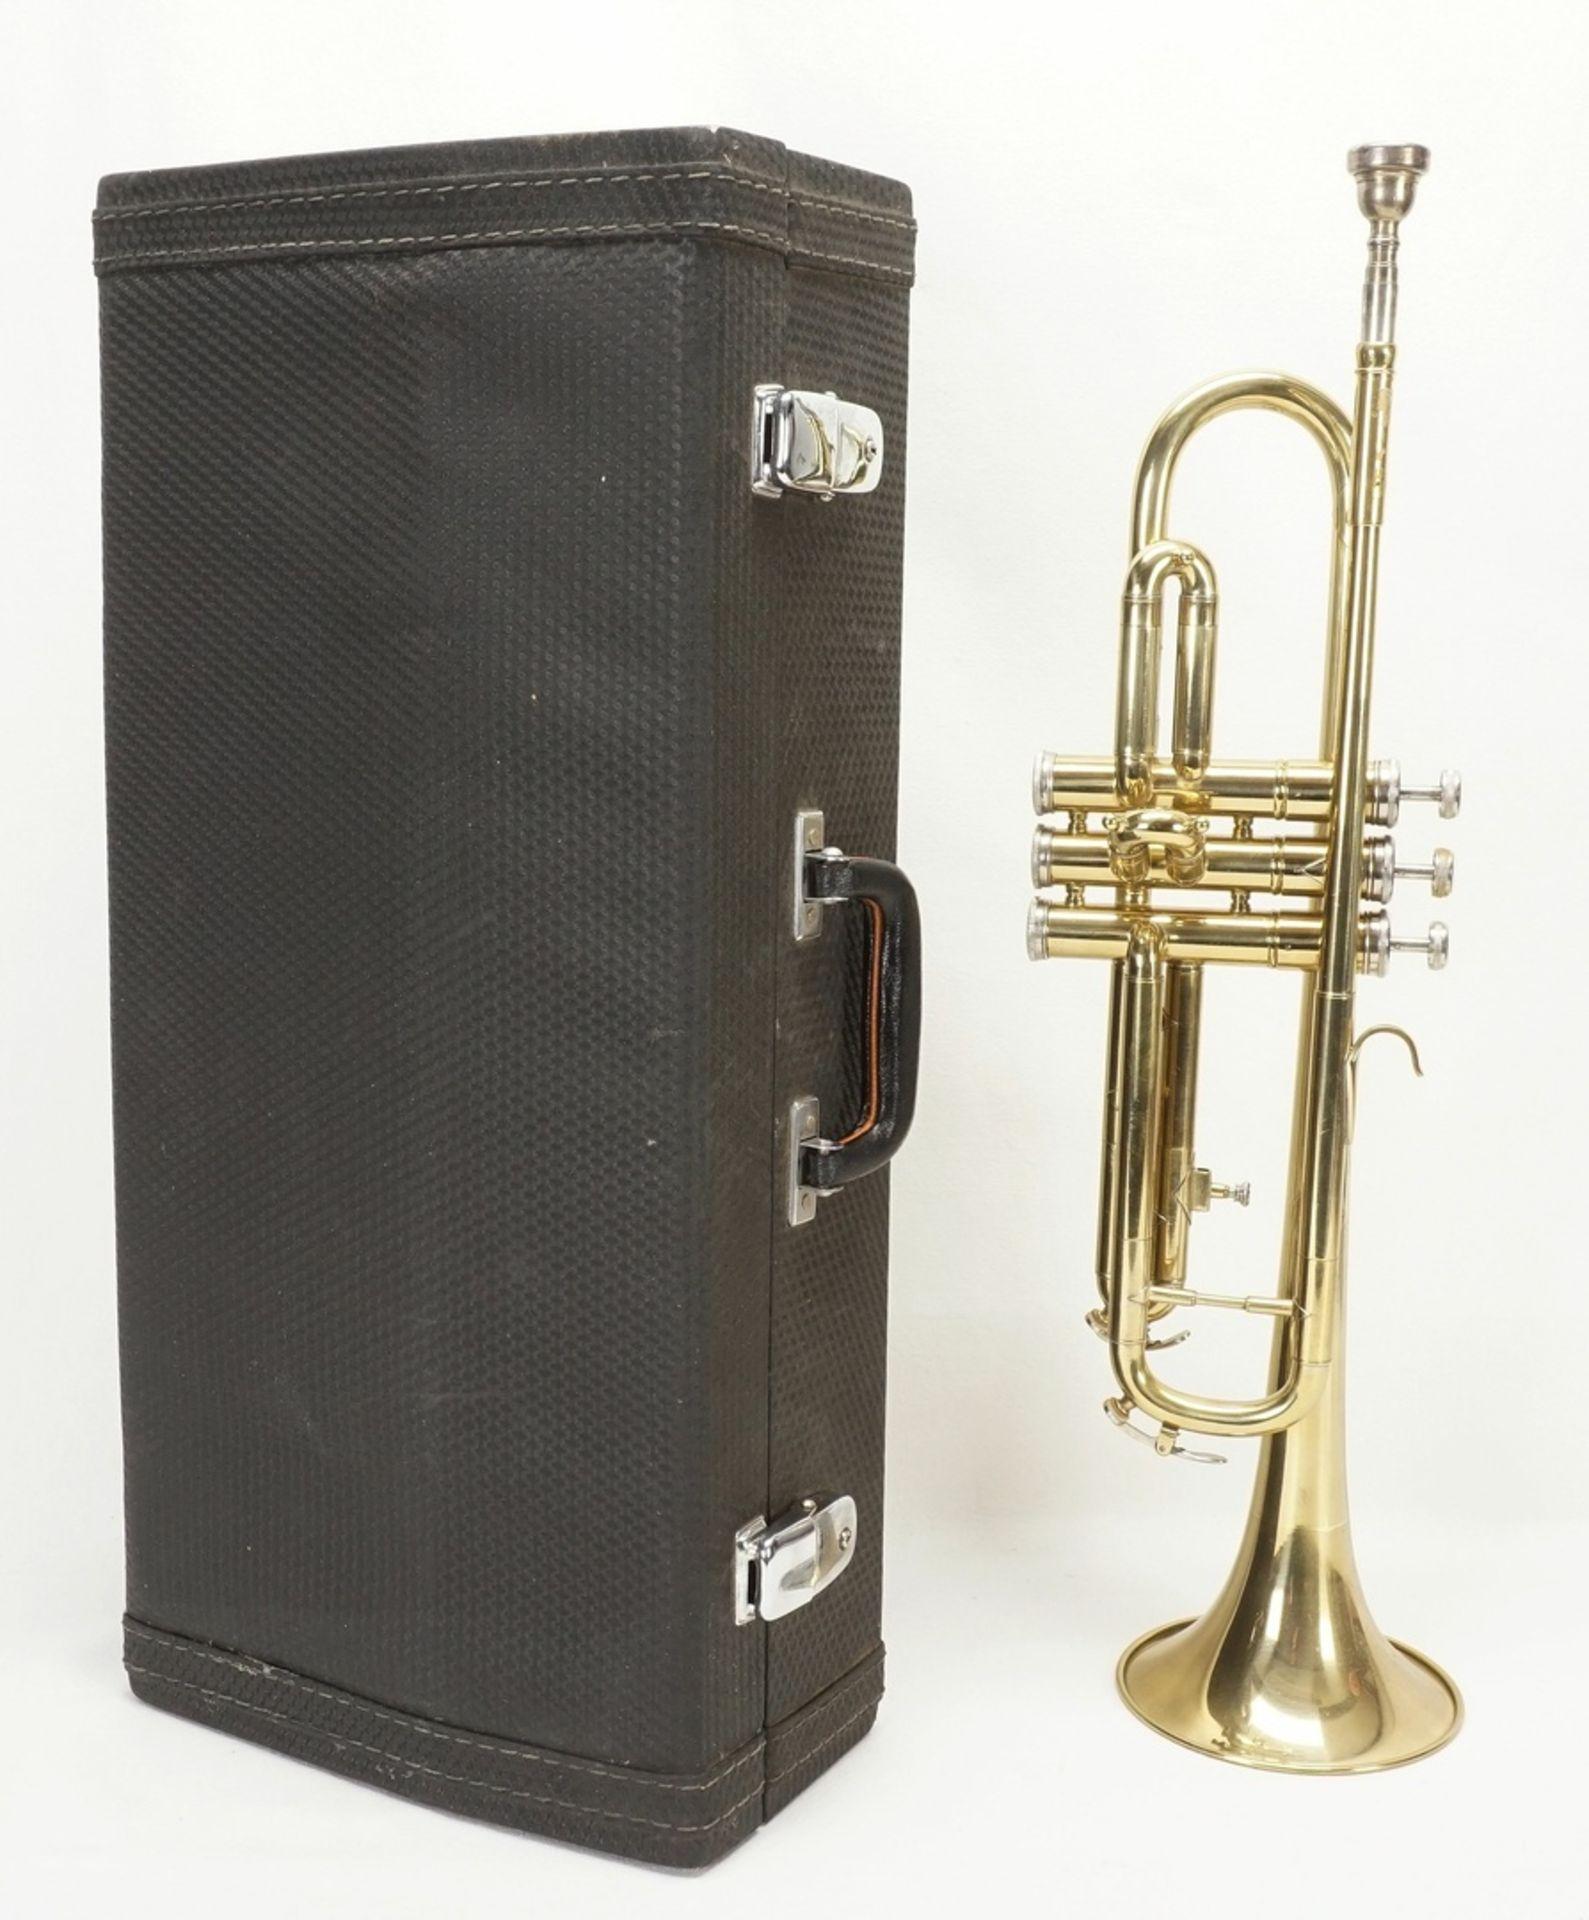 Trompete, 2. Hälfte 20. Jh.